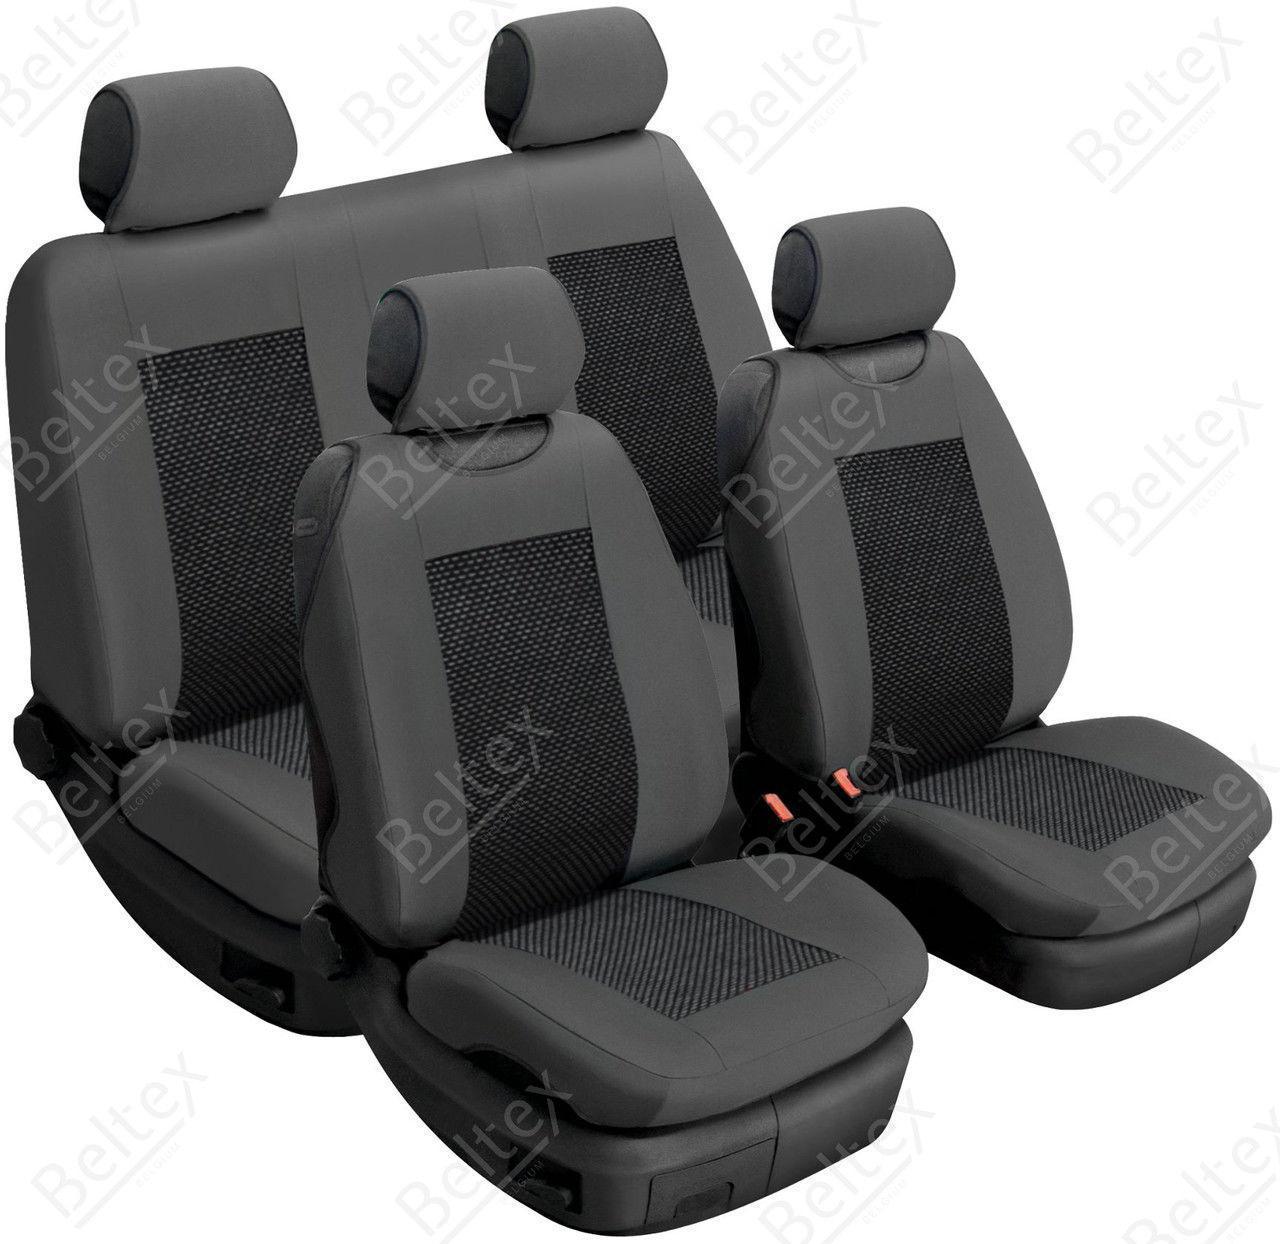 Майки/чехлы на сиденья Тойота Авалон (Toyota Avalon)